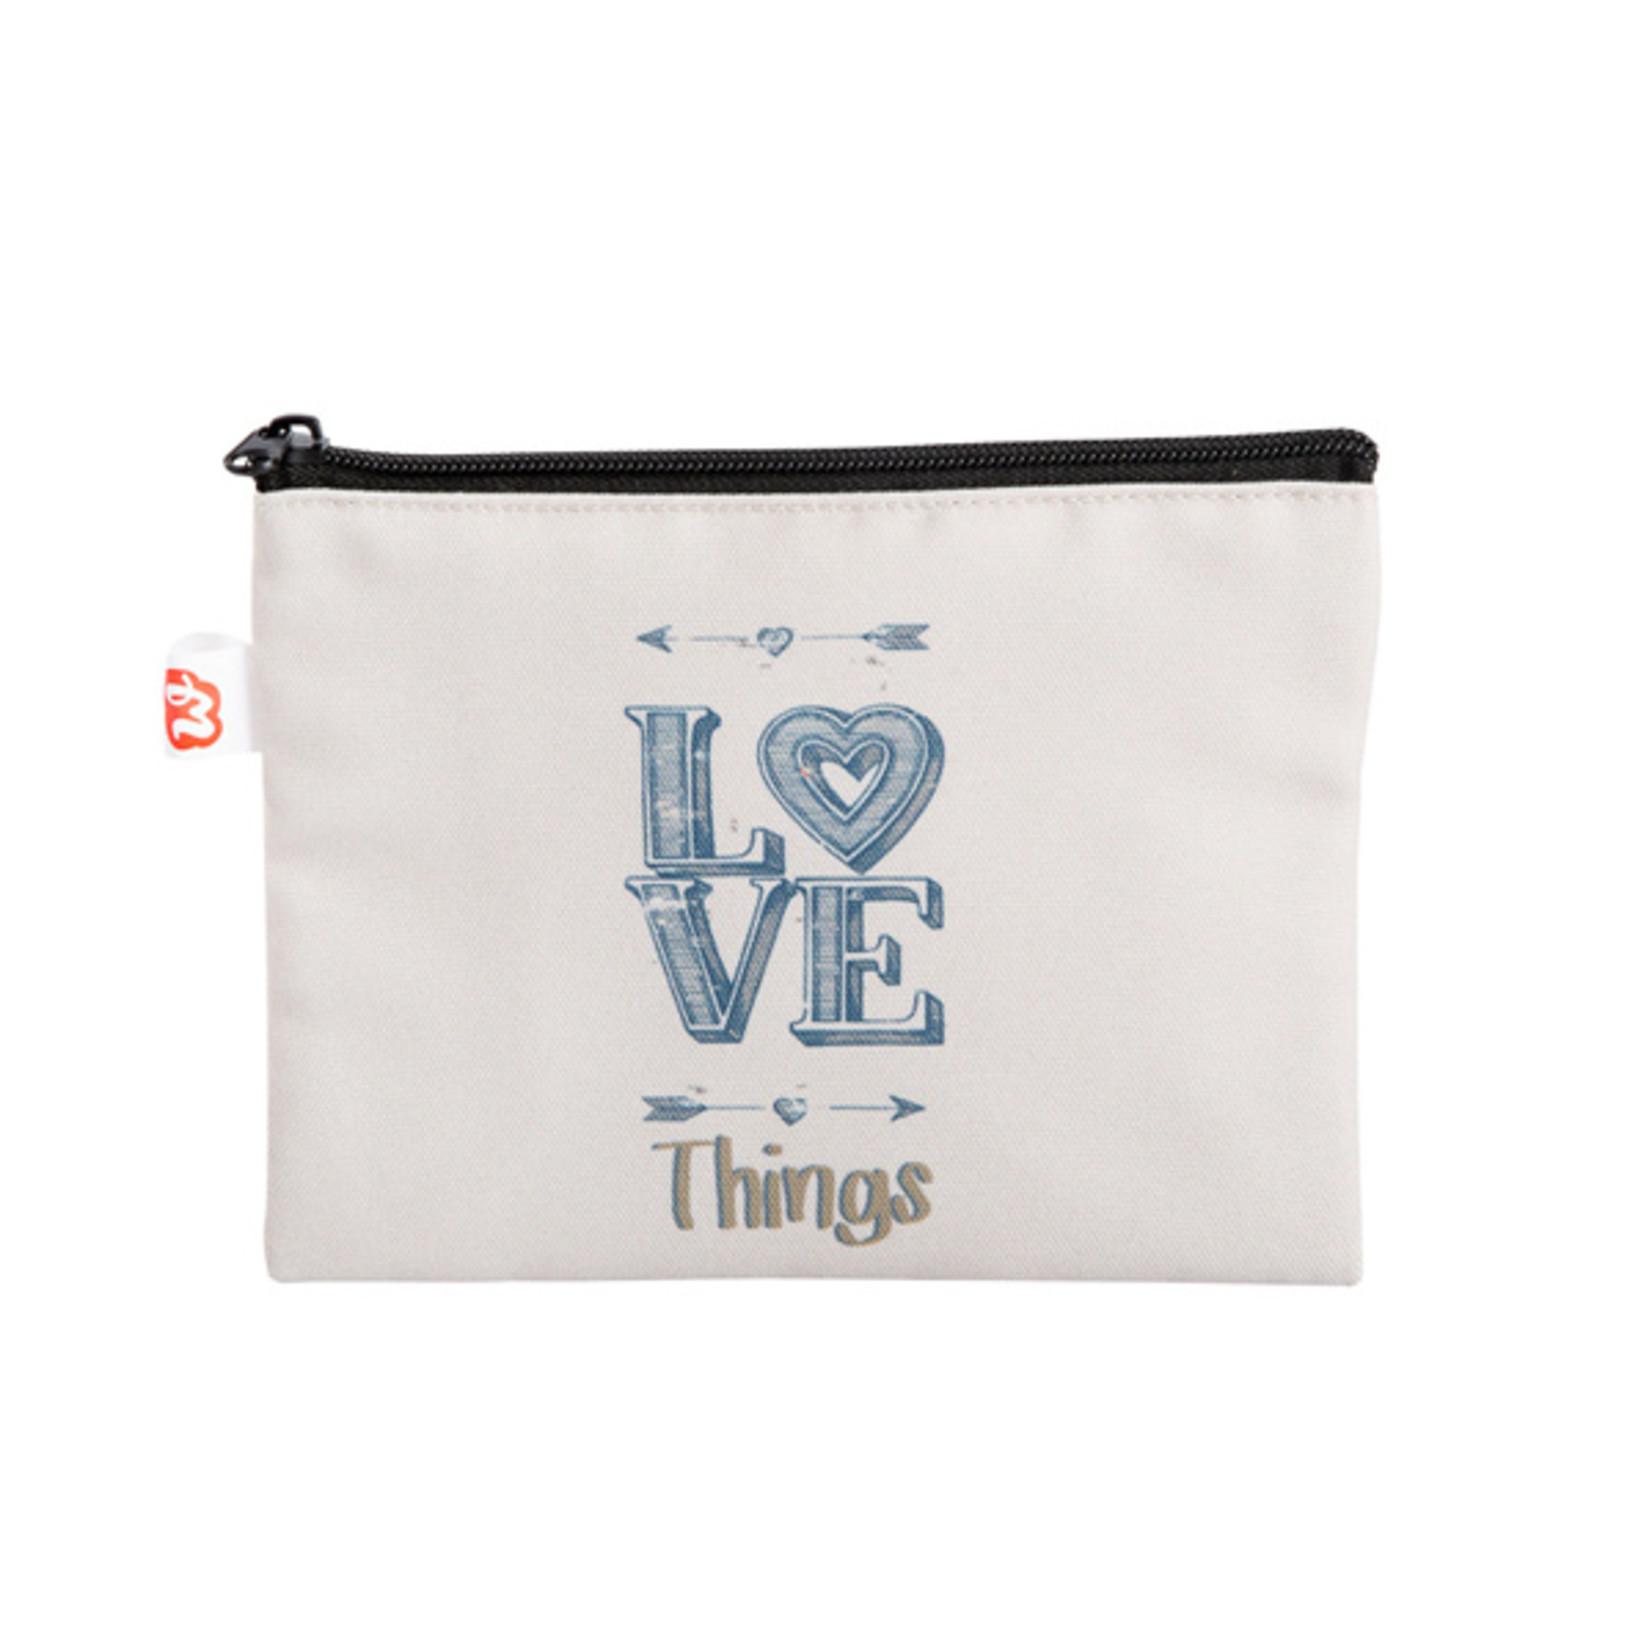 MiCa 33321 Love Things little bag